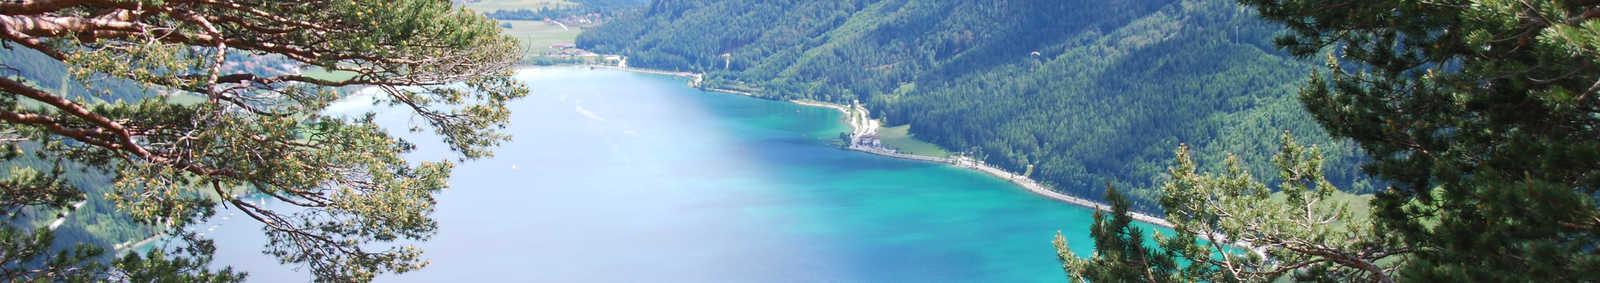 View of Achensee, Austria